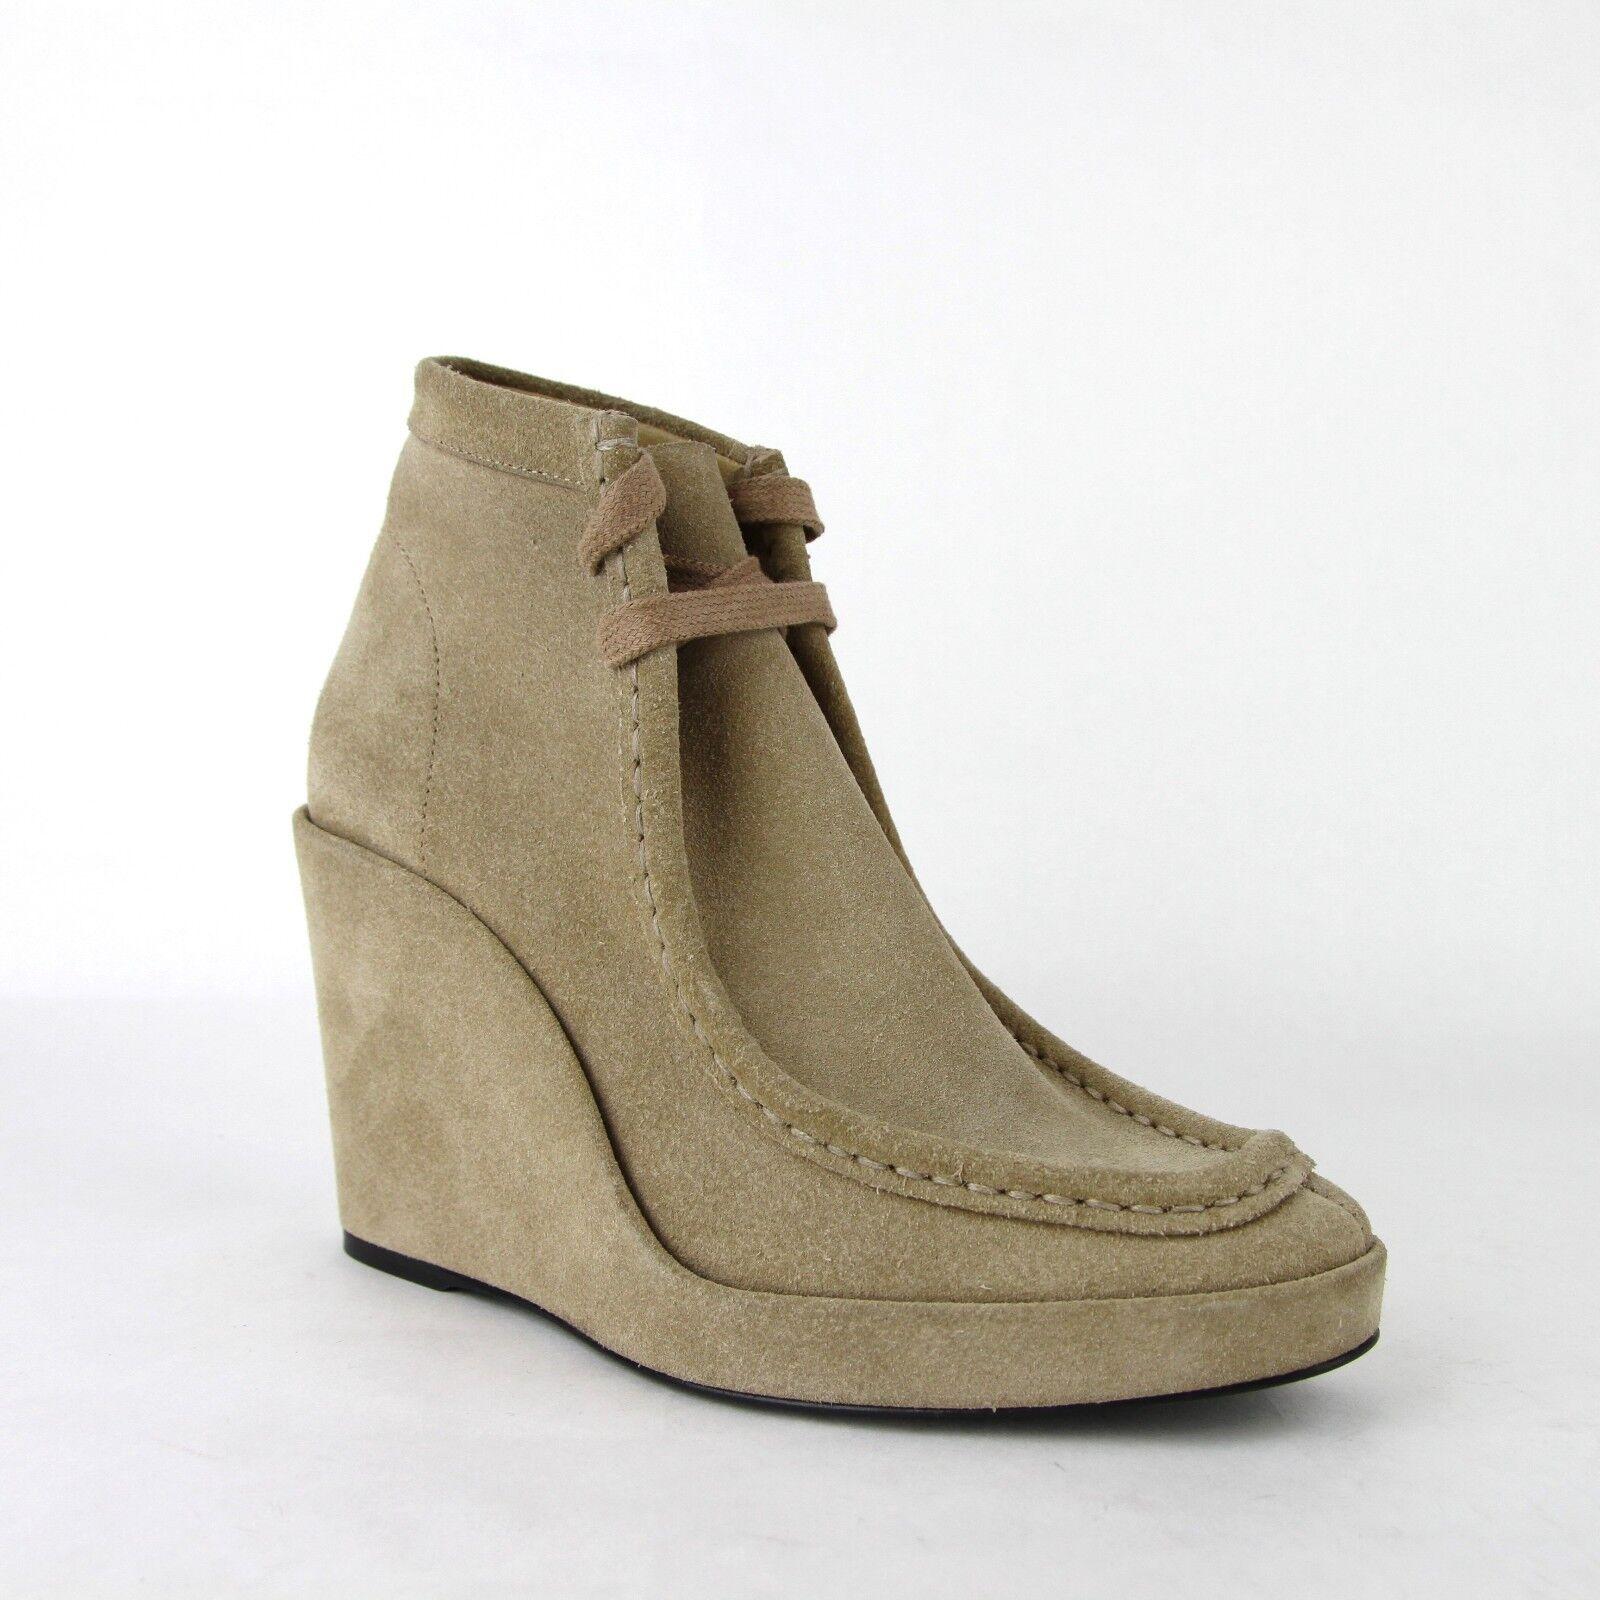 $965 Balenciaga Women Beige Suede Leather Halfboots Wedges 35 391080 2602